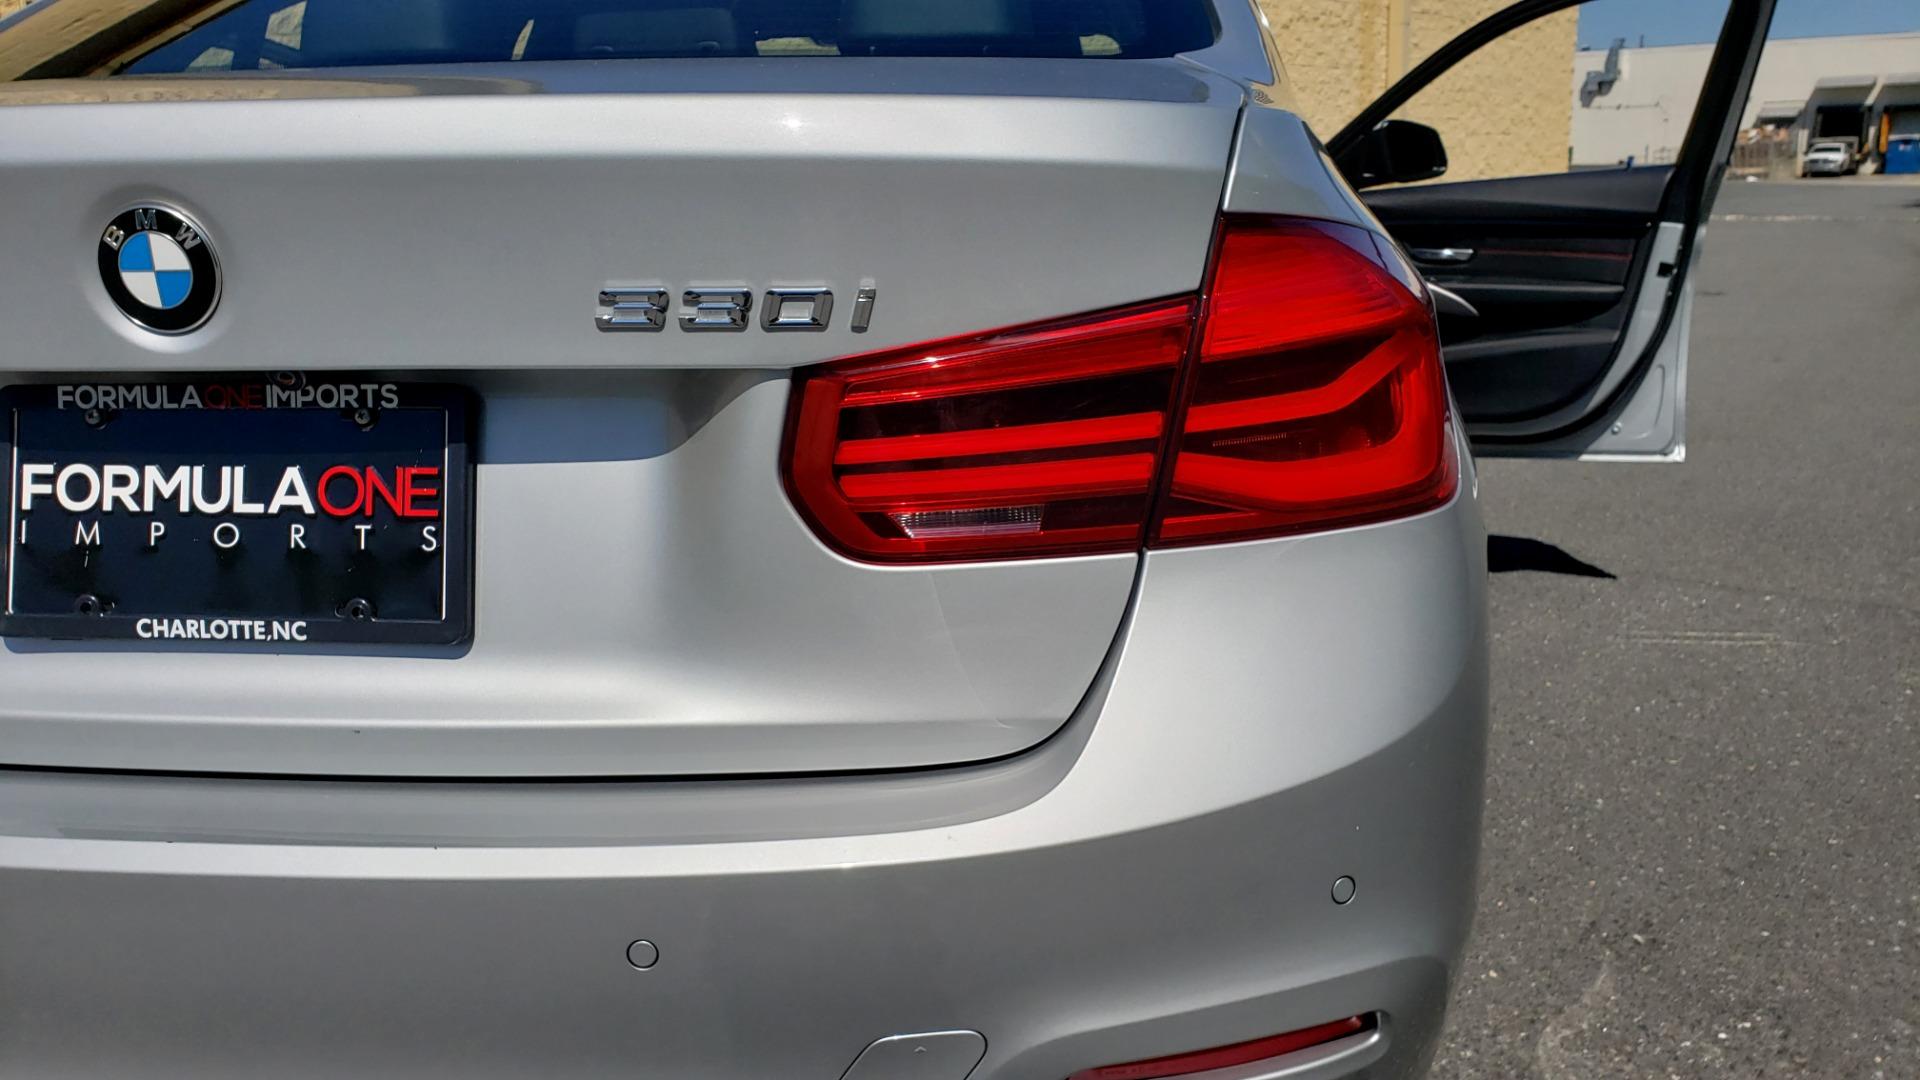 Used 2017 BMW 3 SERIES 330I SPORT SEDAN / DRVR ASST PKG / SUNROOF / REARVIEW for sale Sold at Formula Imports in Charlotte NC 28227 26